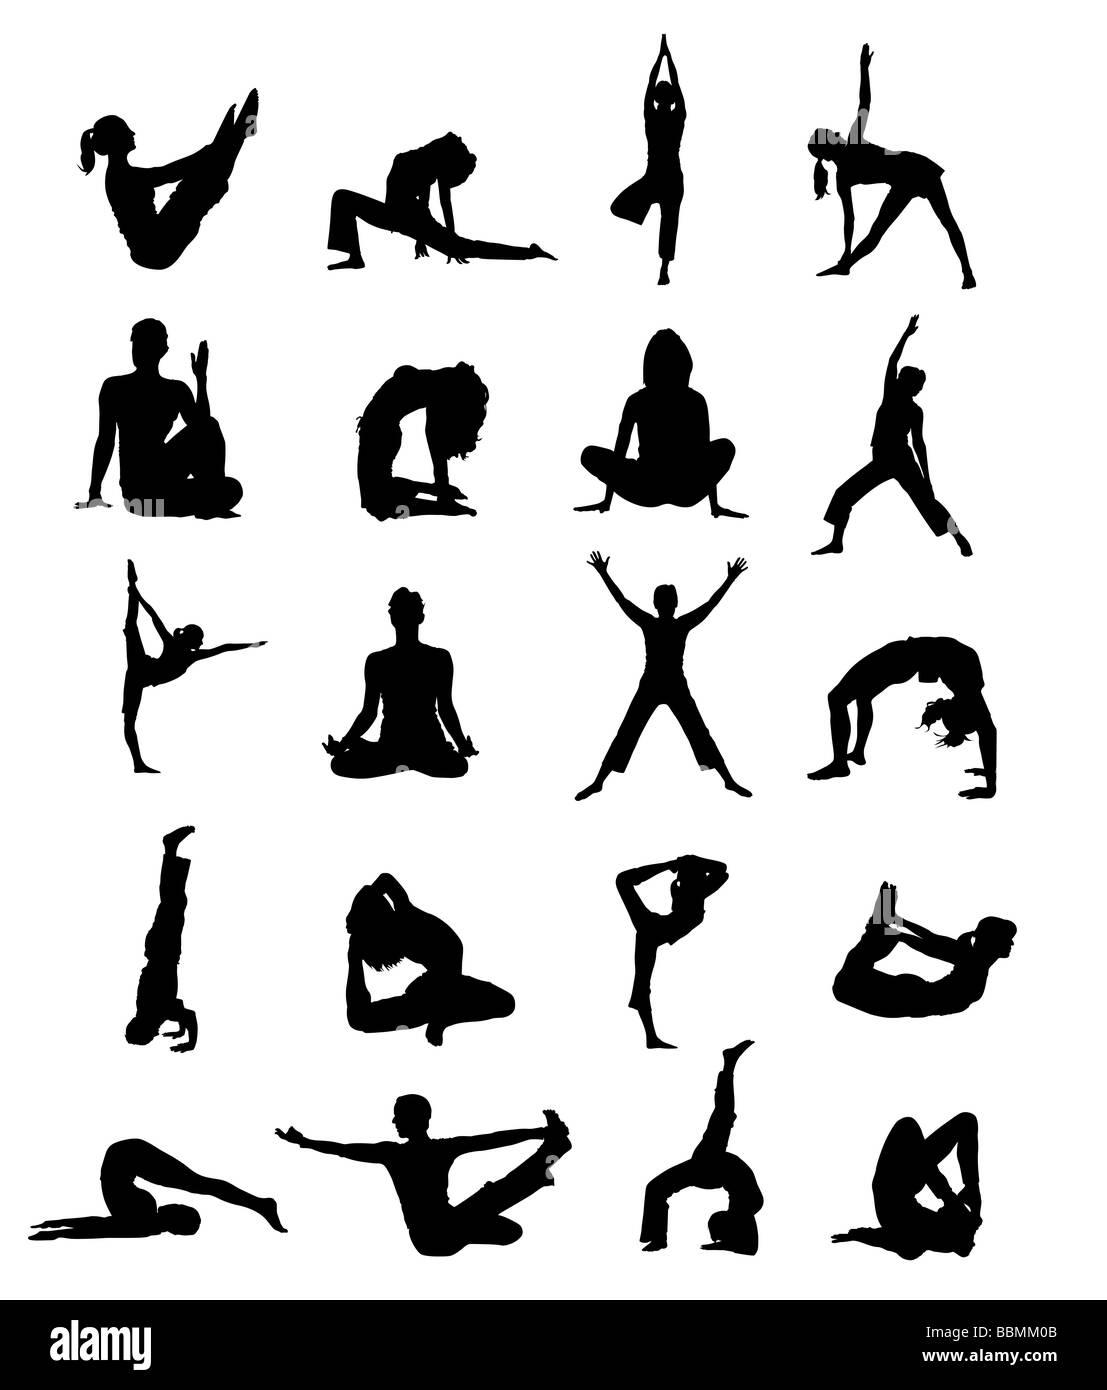 graphic illustration silhouette people joga gym sport - Stock Image